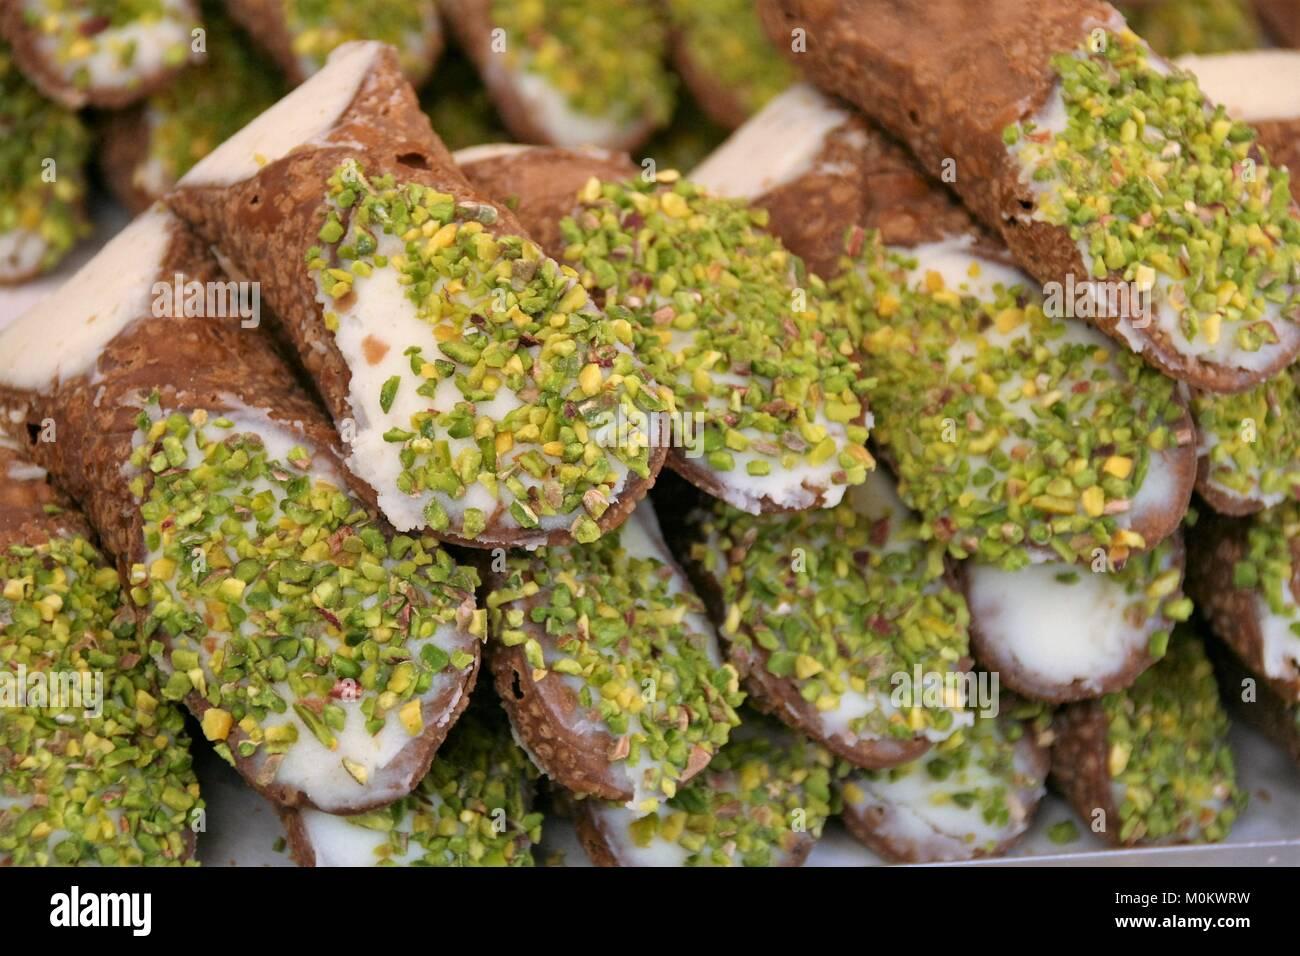 Sicilian Sci Olive Garden Recipe Garden Ftempo